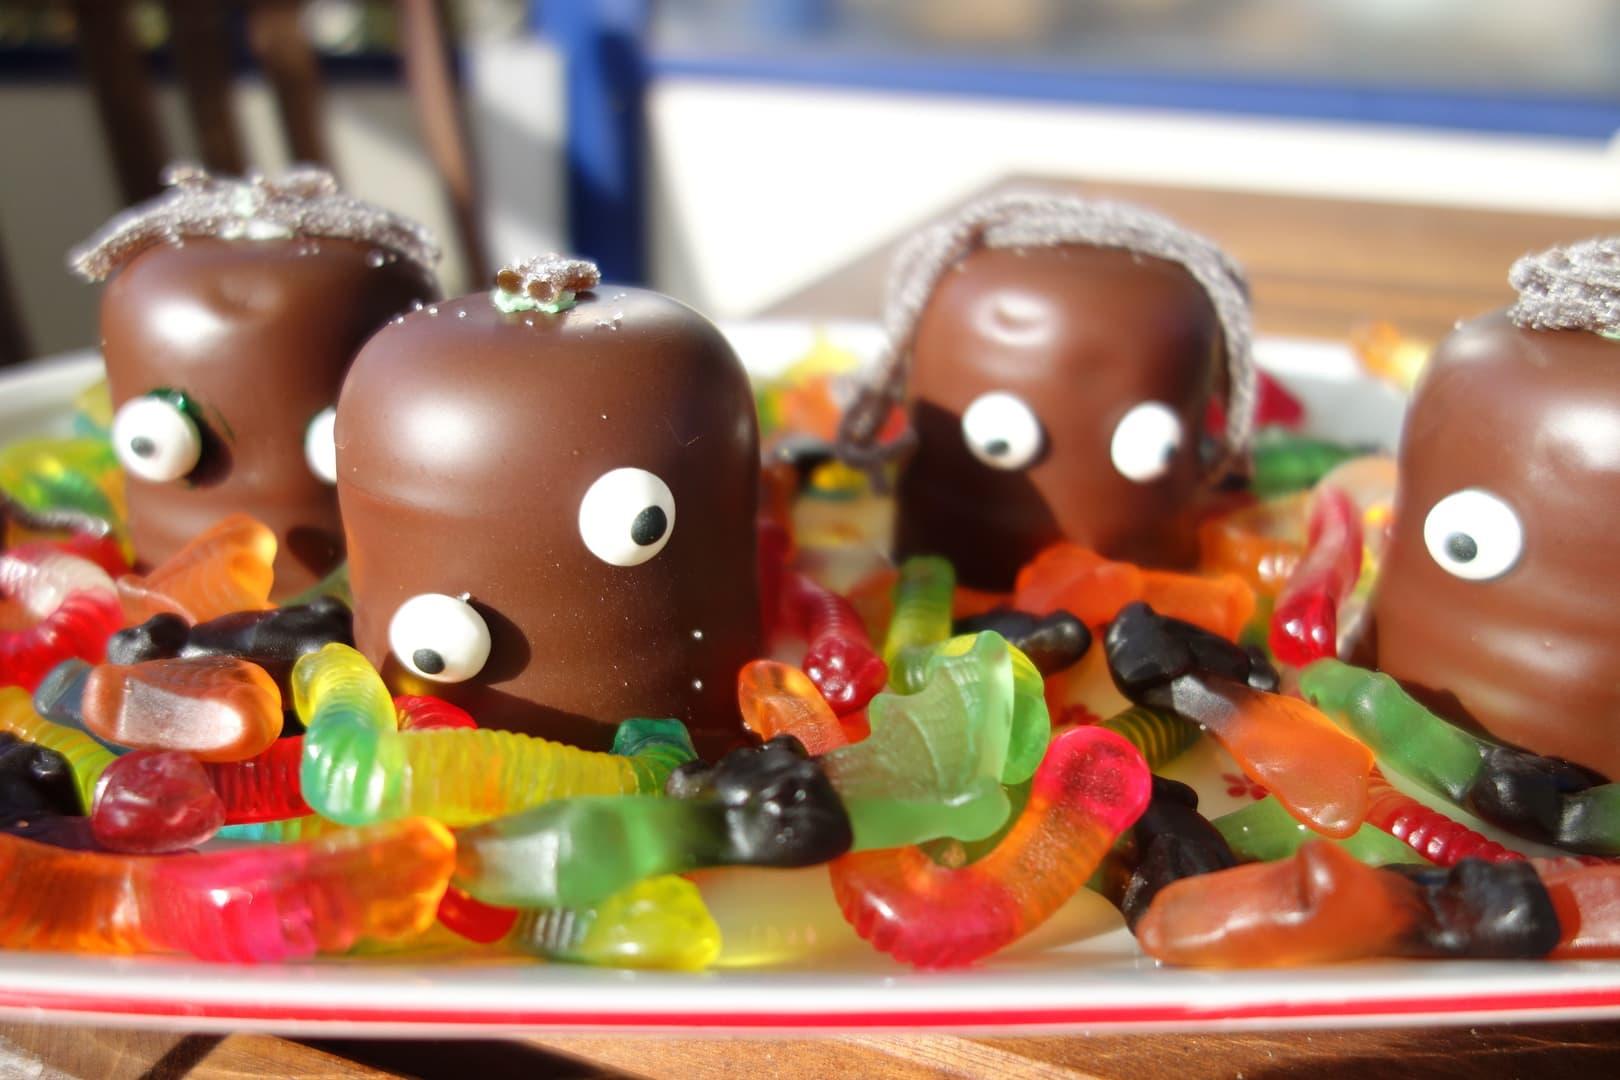 Großzügig Süßigkeiten Skulls Malvorlagen Galerie - Entry Level ...